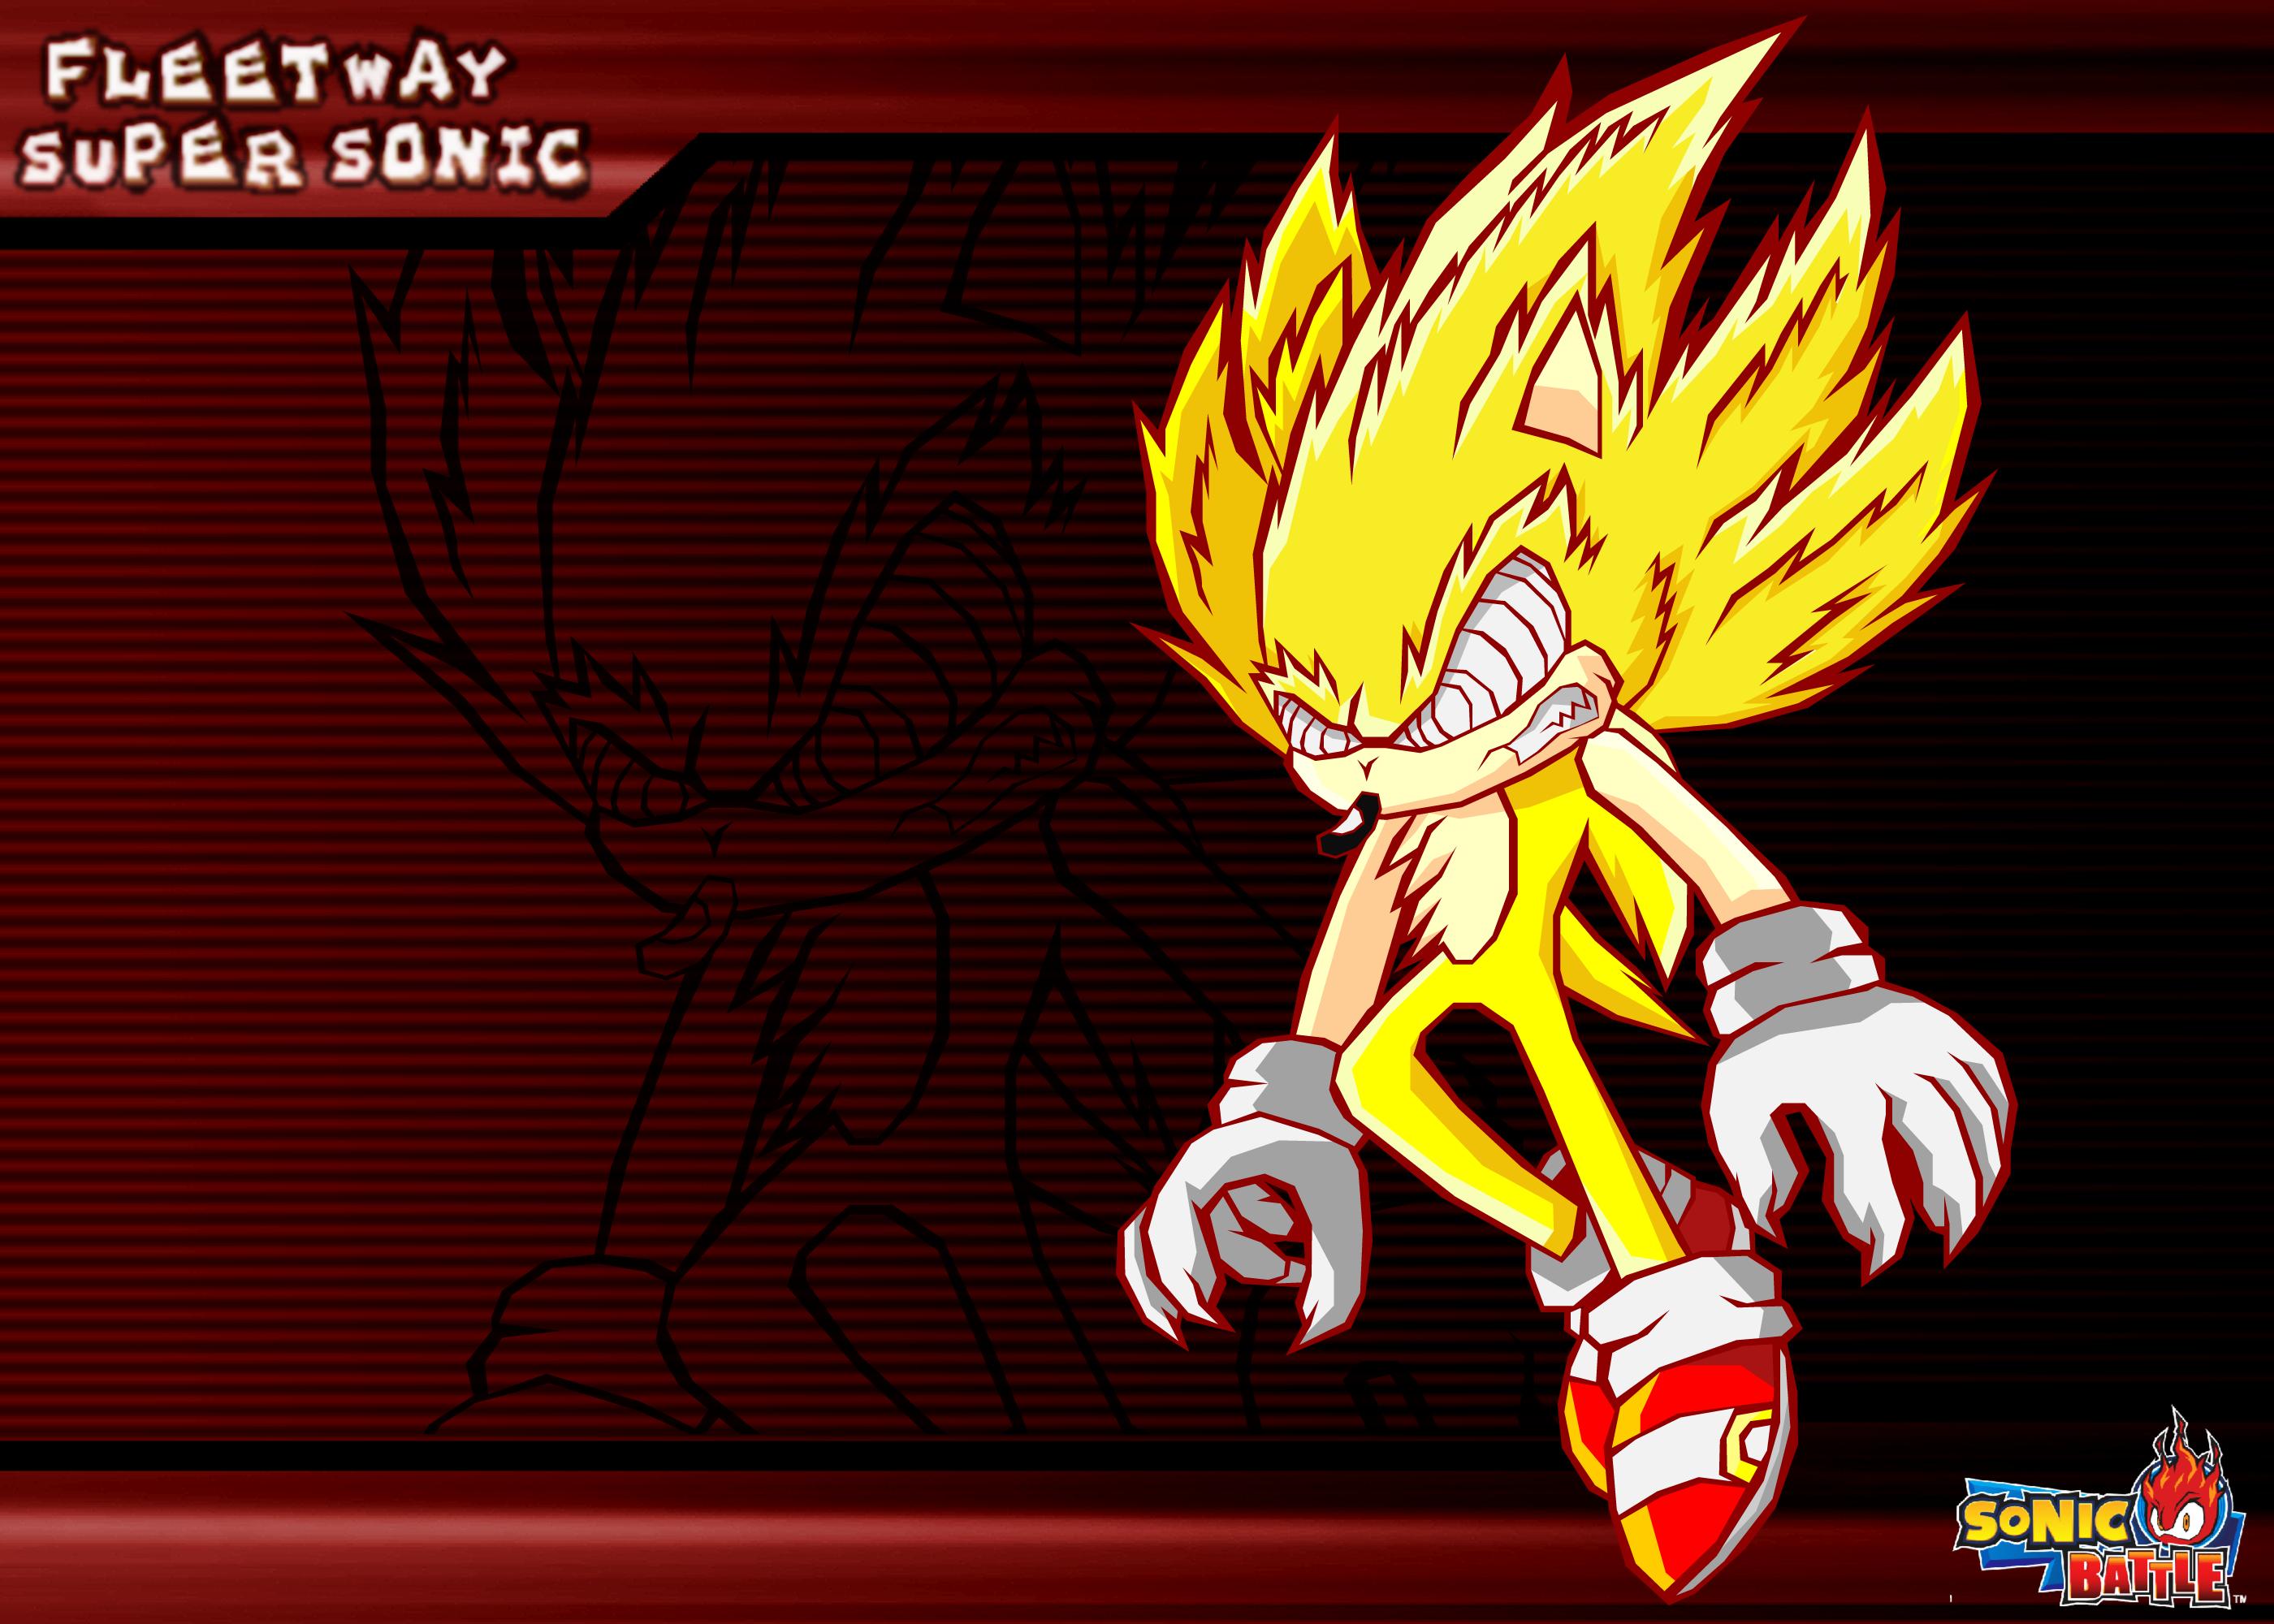 Fleetway Supersonic: Fleetway Super Sonic -Battle- By